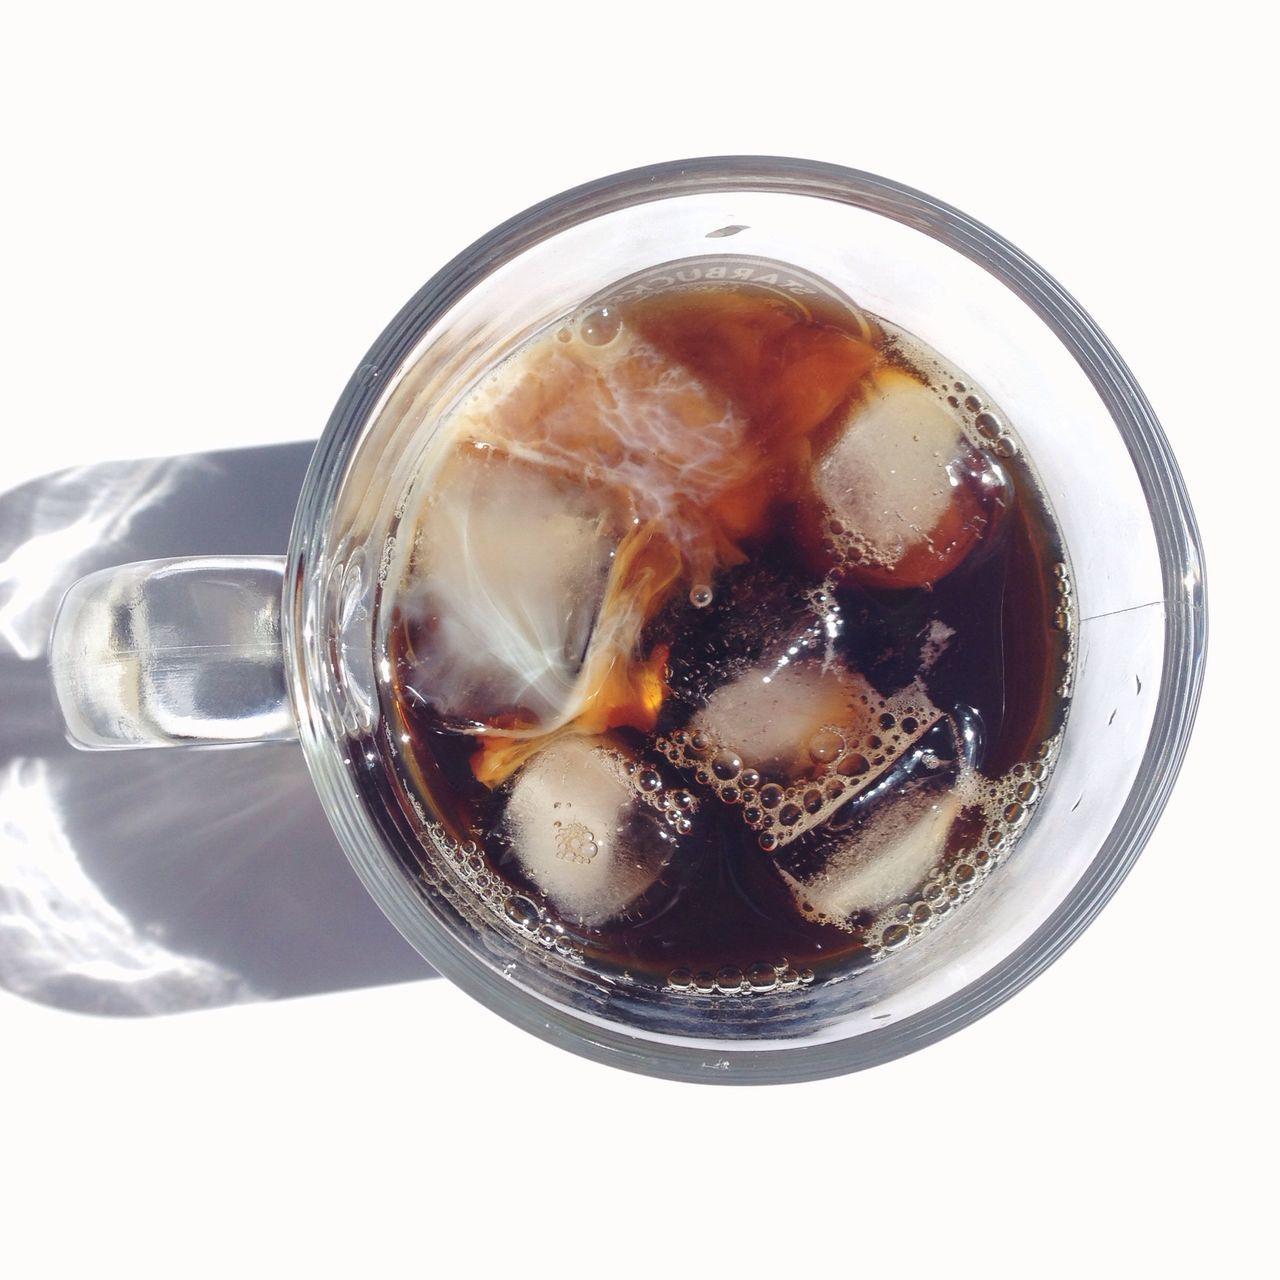 ☕️Ice coffee + hot days = ♡ Ice Coffee Delicious Enjoying The Sun The EyeEm Breakfast Club